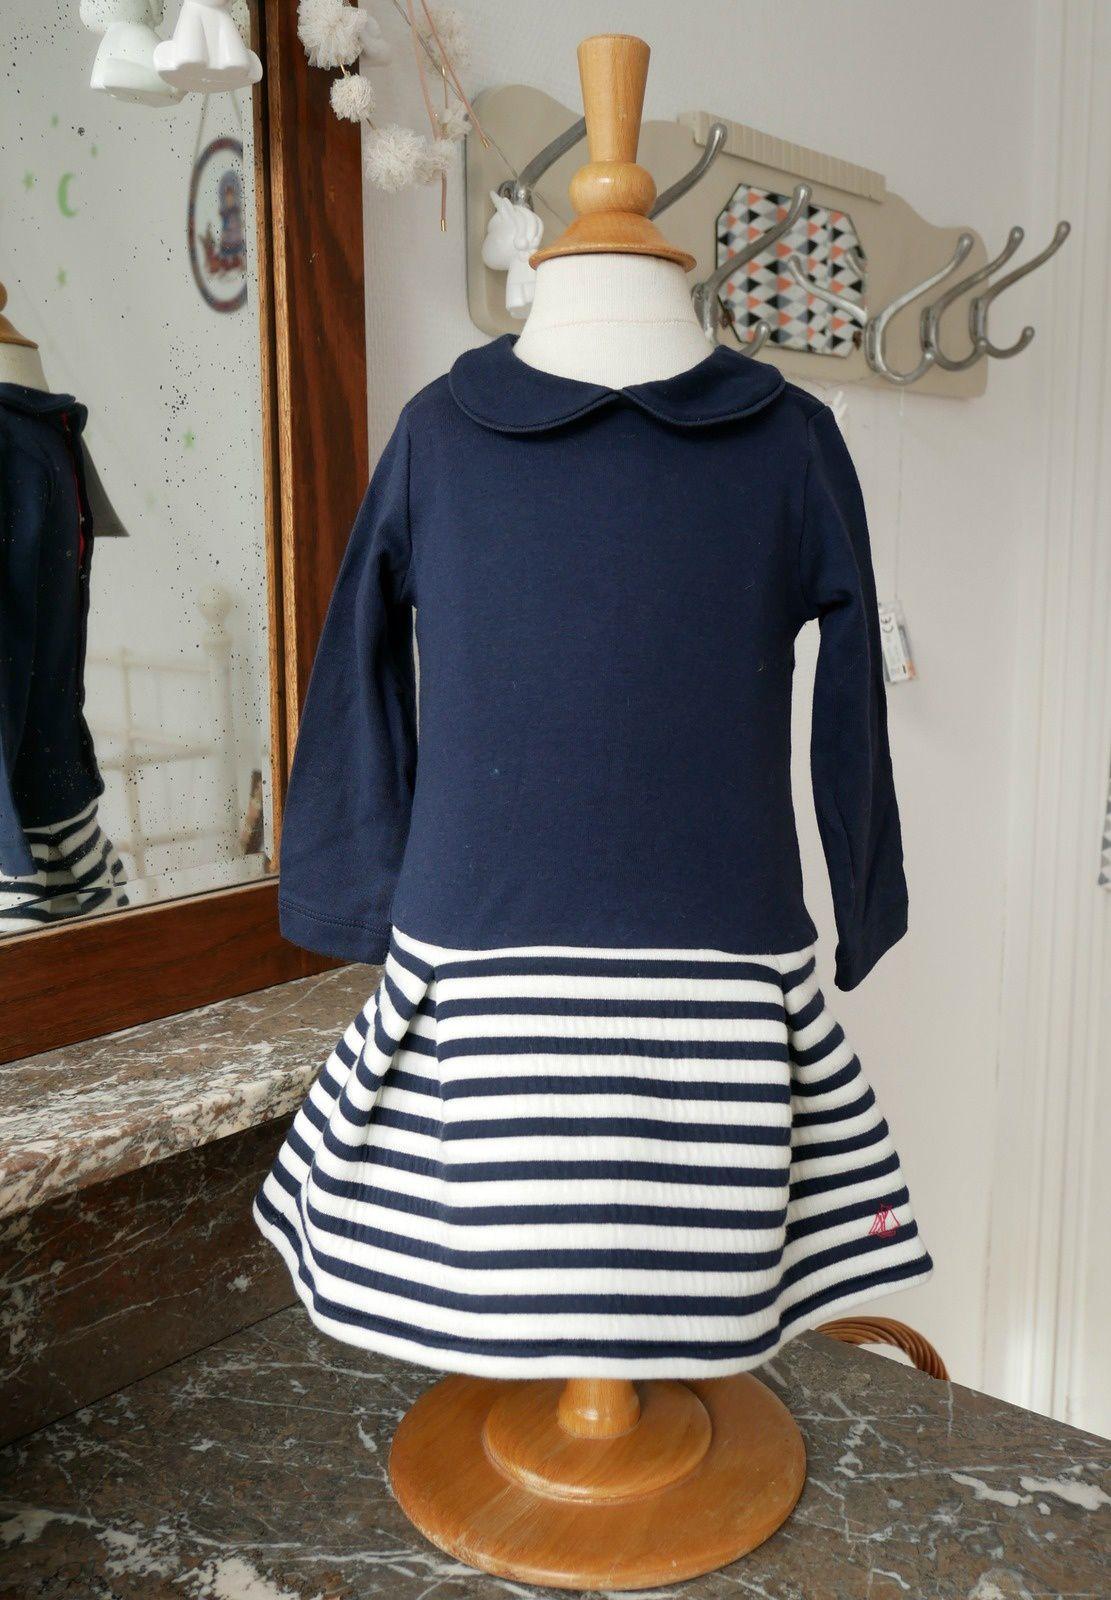 Une garde-robe responsable // Chap 1